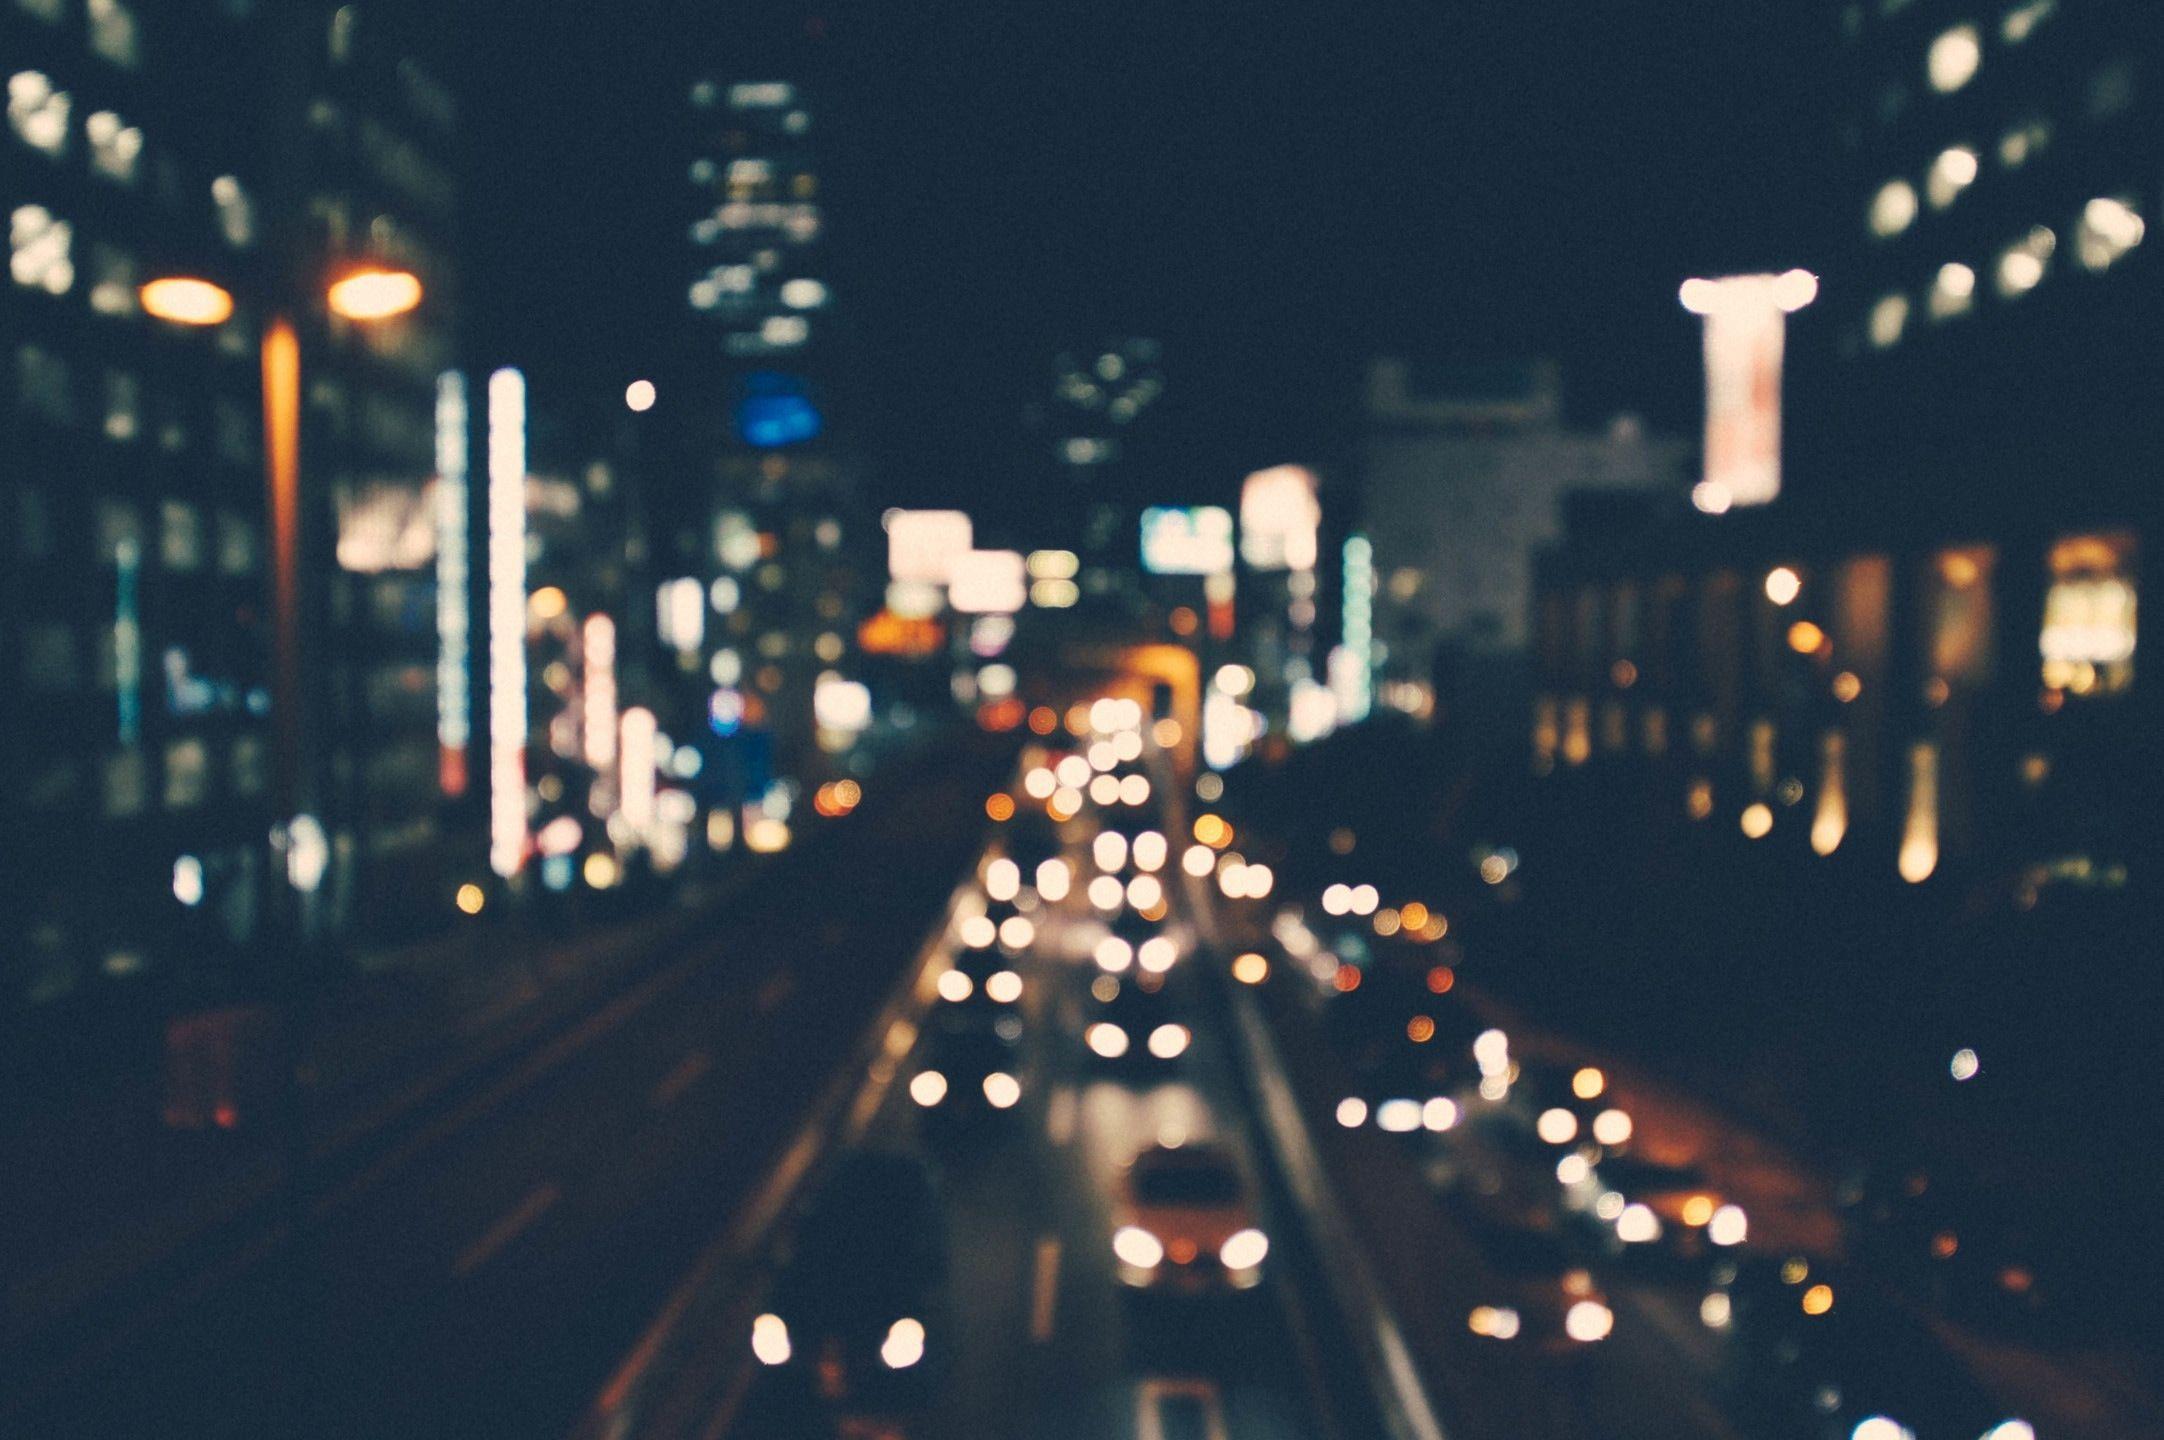 1920x1080 Blurred City Lights Widescreen Background Wallpaper